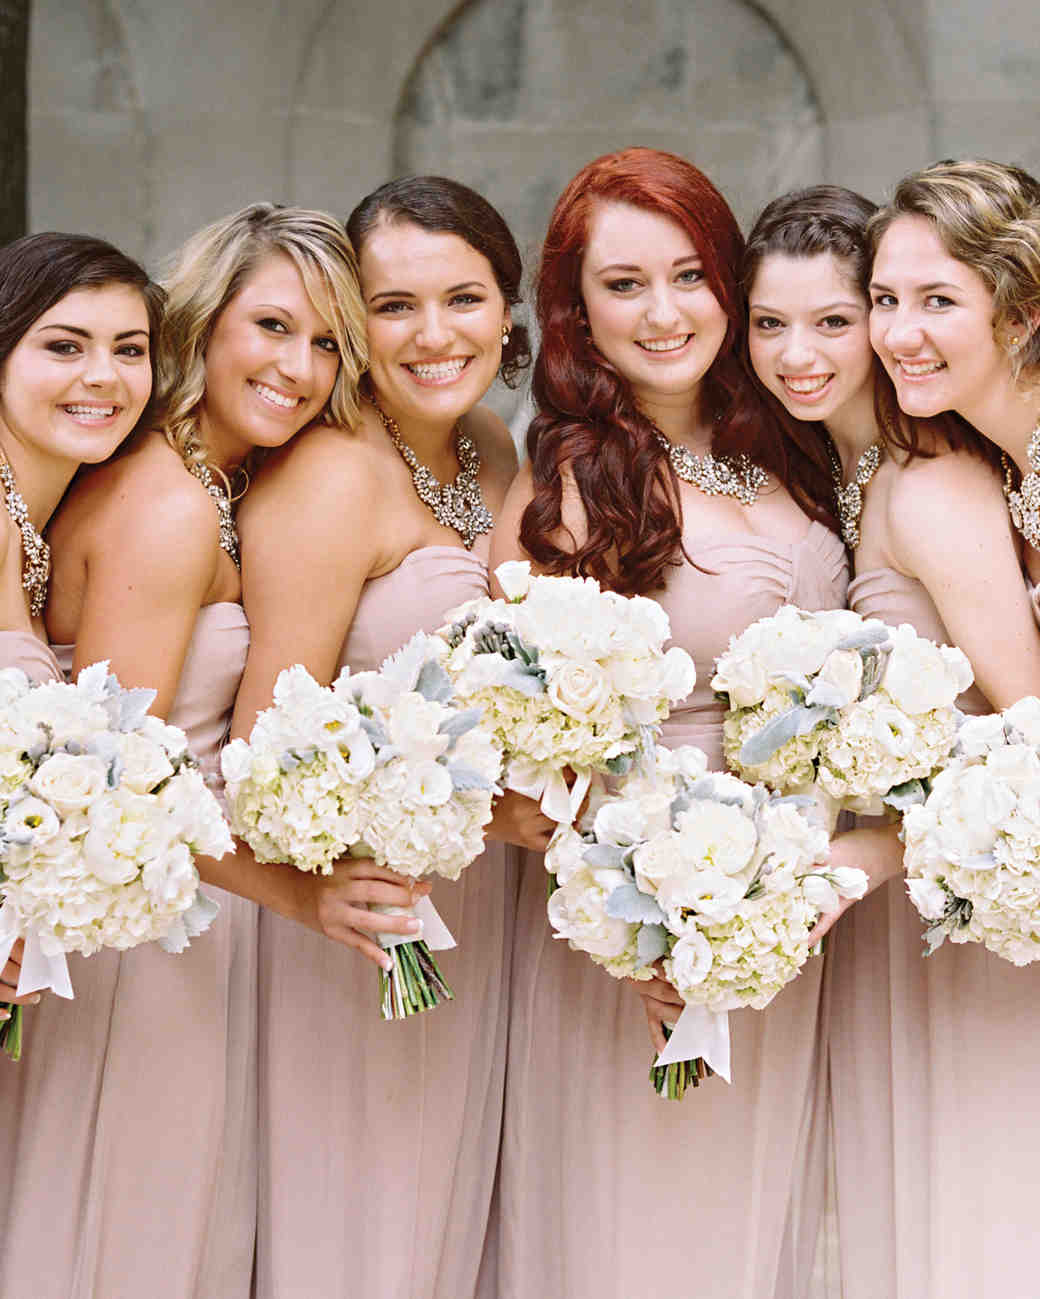 elizabeth-cody-real-wedding-bridesmaids-pink-dresses-bouquets.jpg